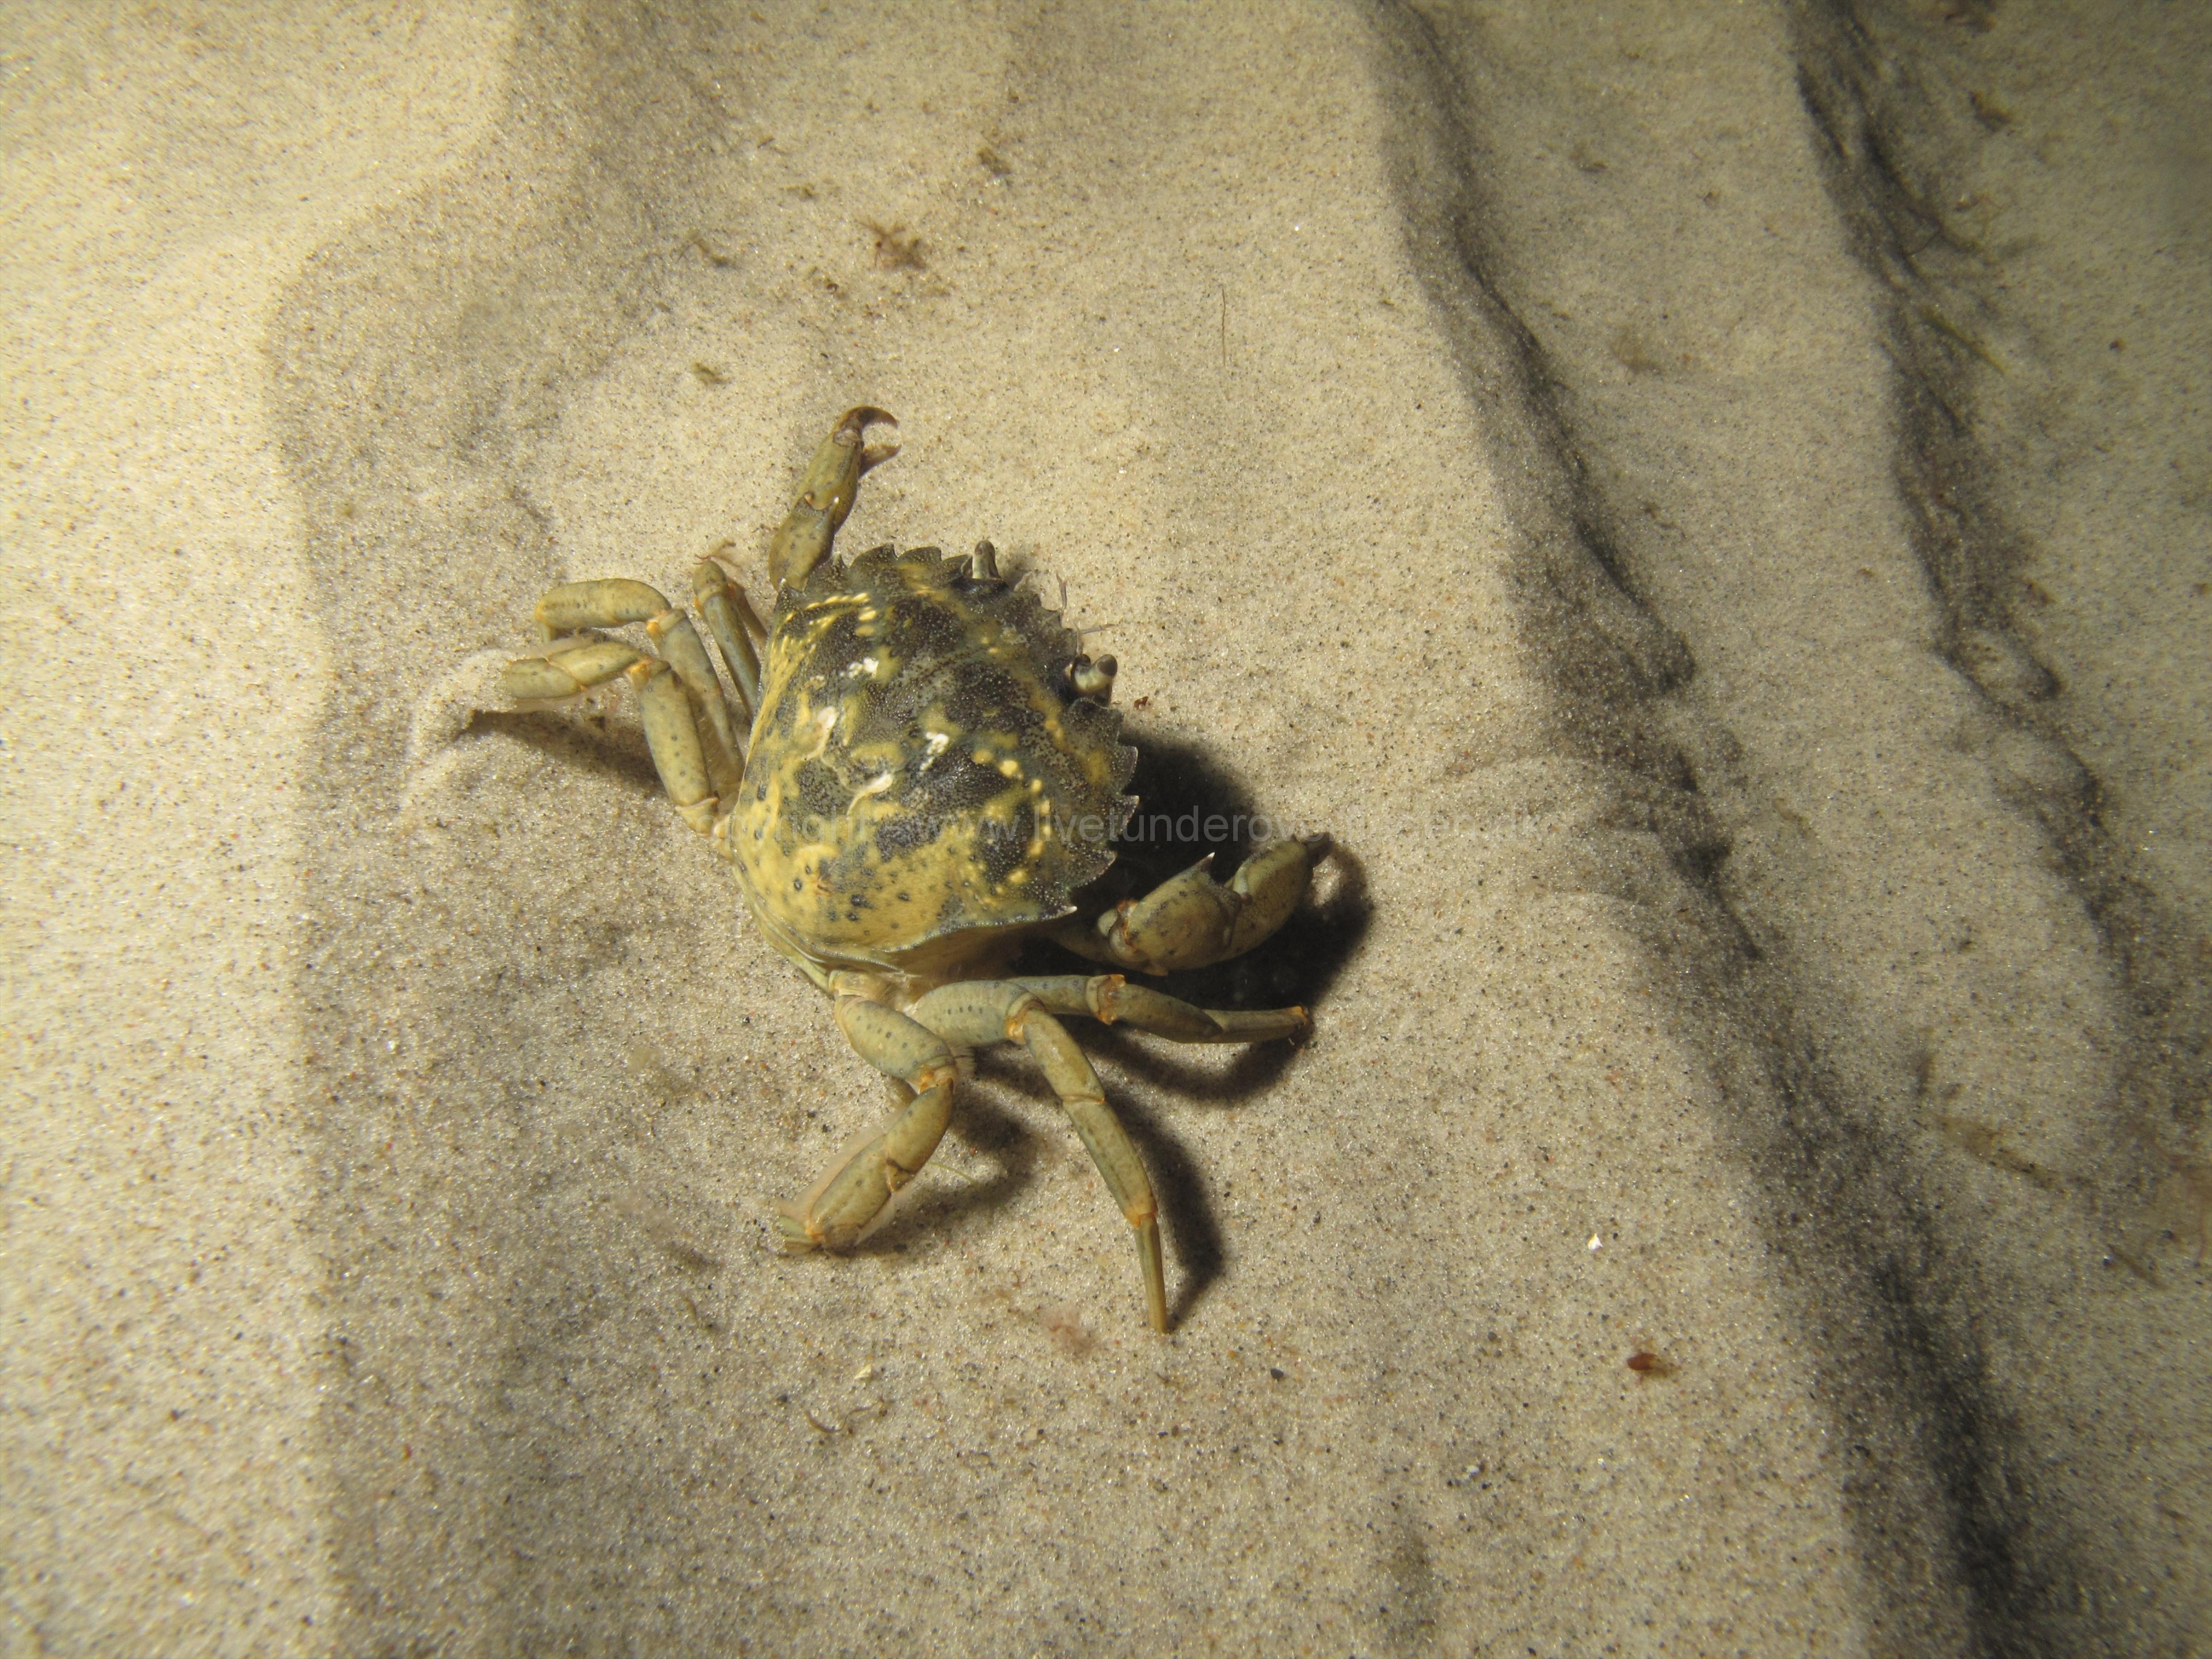 crab_strandkrabbe_martin kielland